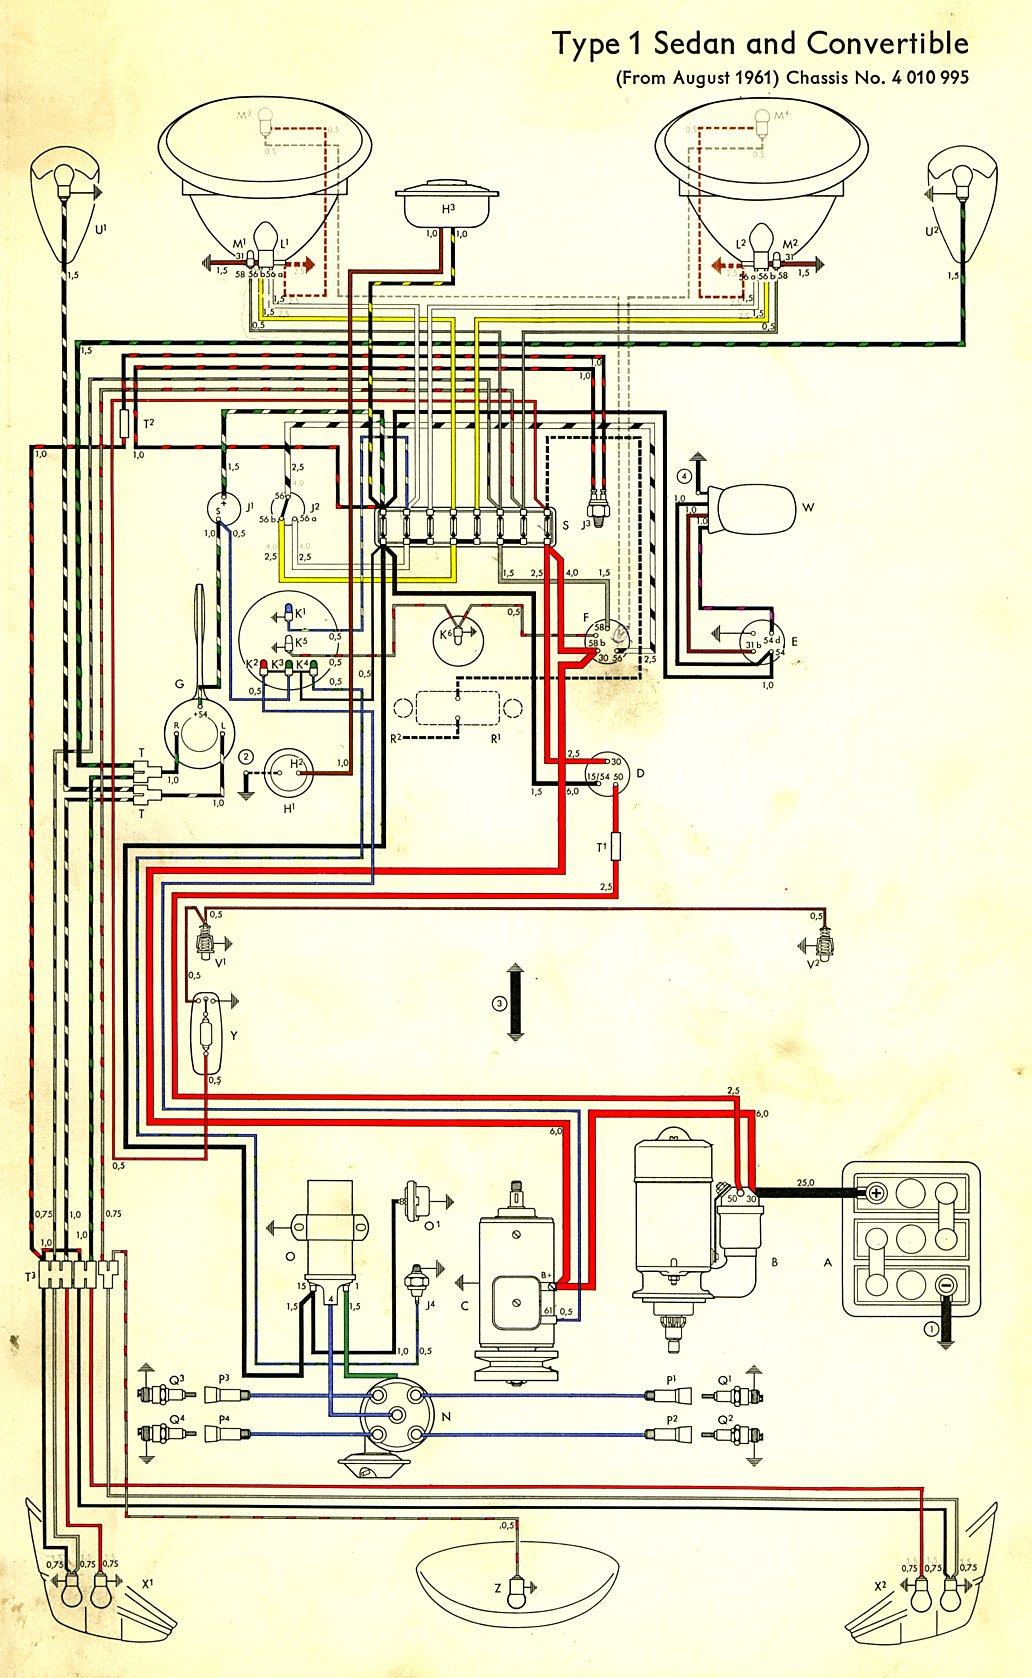 WF_8078] 1962 Vw Bug Wiring Diagram Download DiagramNnigh Benkeme Mohammedshrine Librar Wiring 101